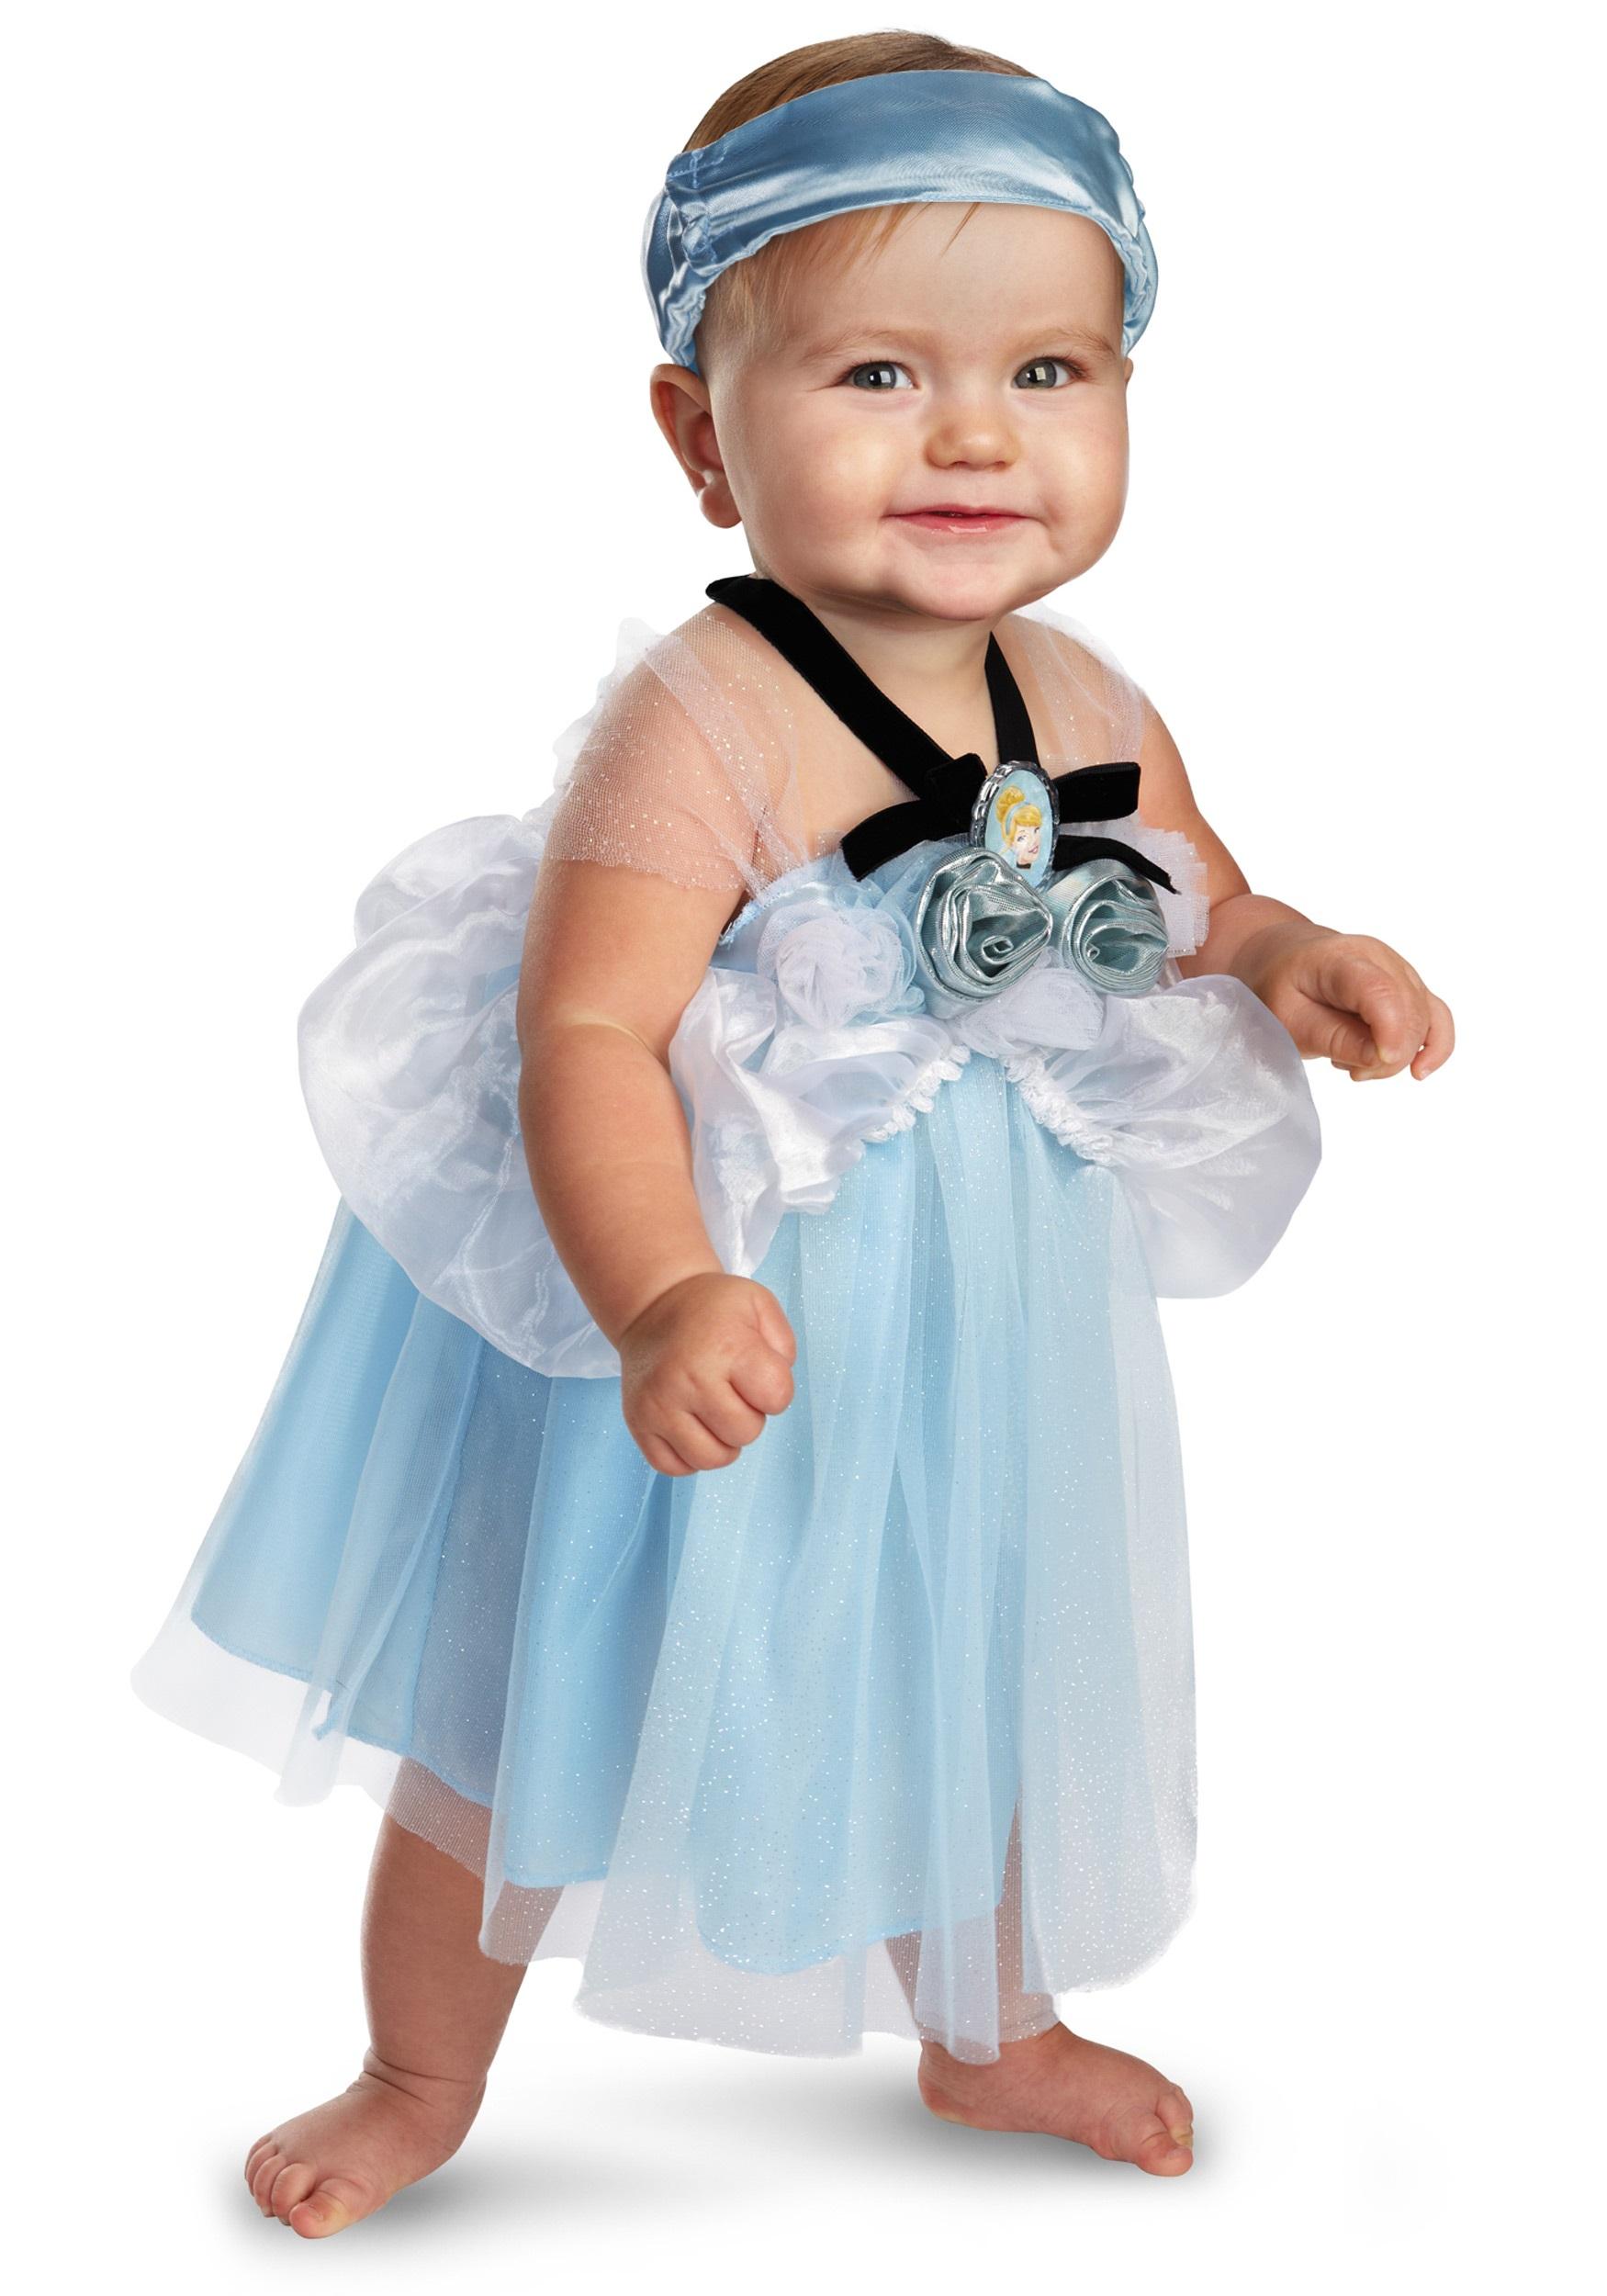 Infant Cinderella My First Disney Costume  sc 1 st  Halloween Costumes & Infant Cinderella My First Disney Costume - Halloween Costumes